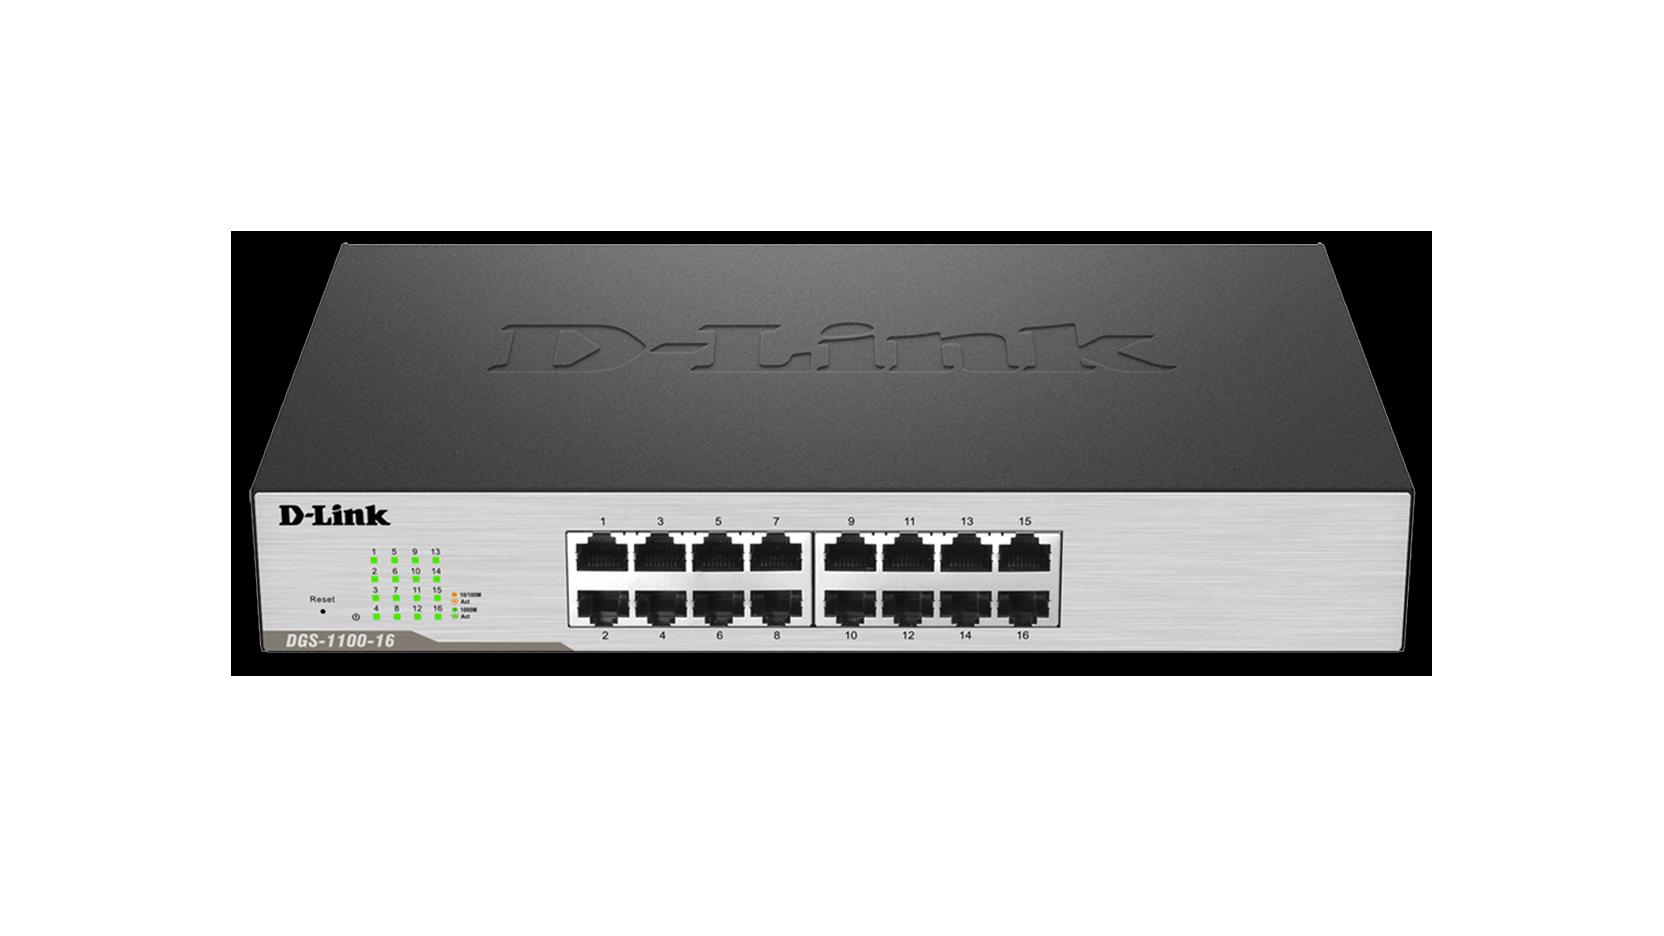 DLink Smart Managed Port Gigabit Switch DGS DLink - Switch 16 ports gigabit